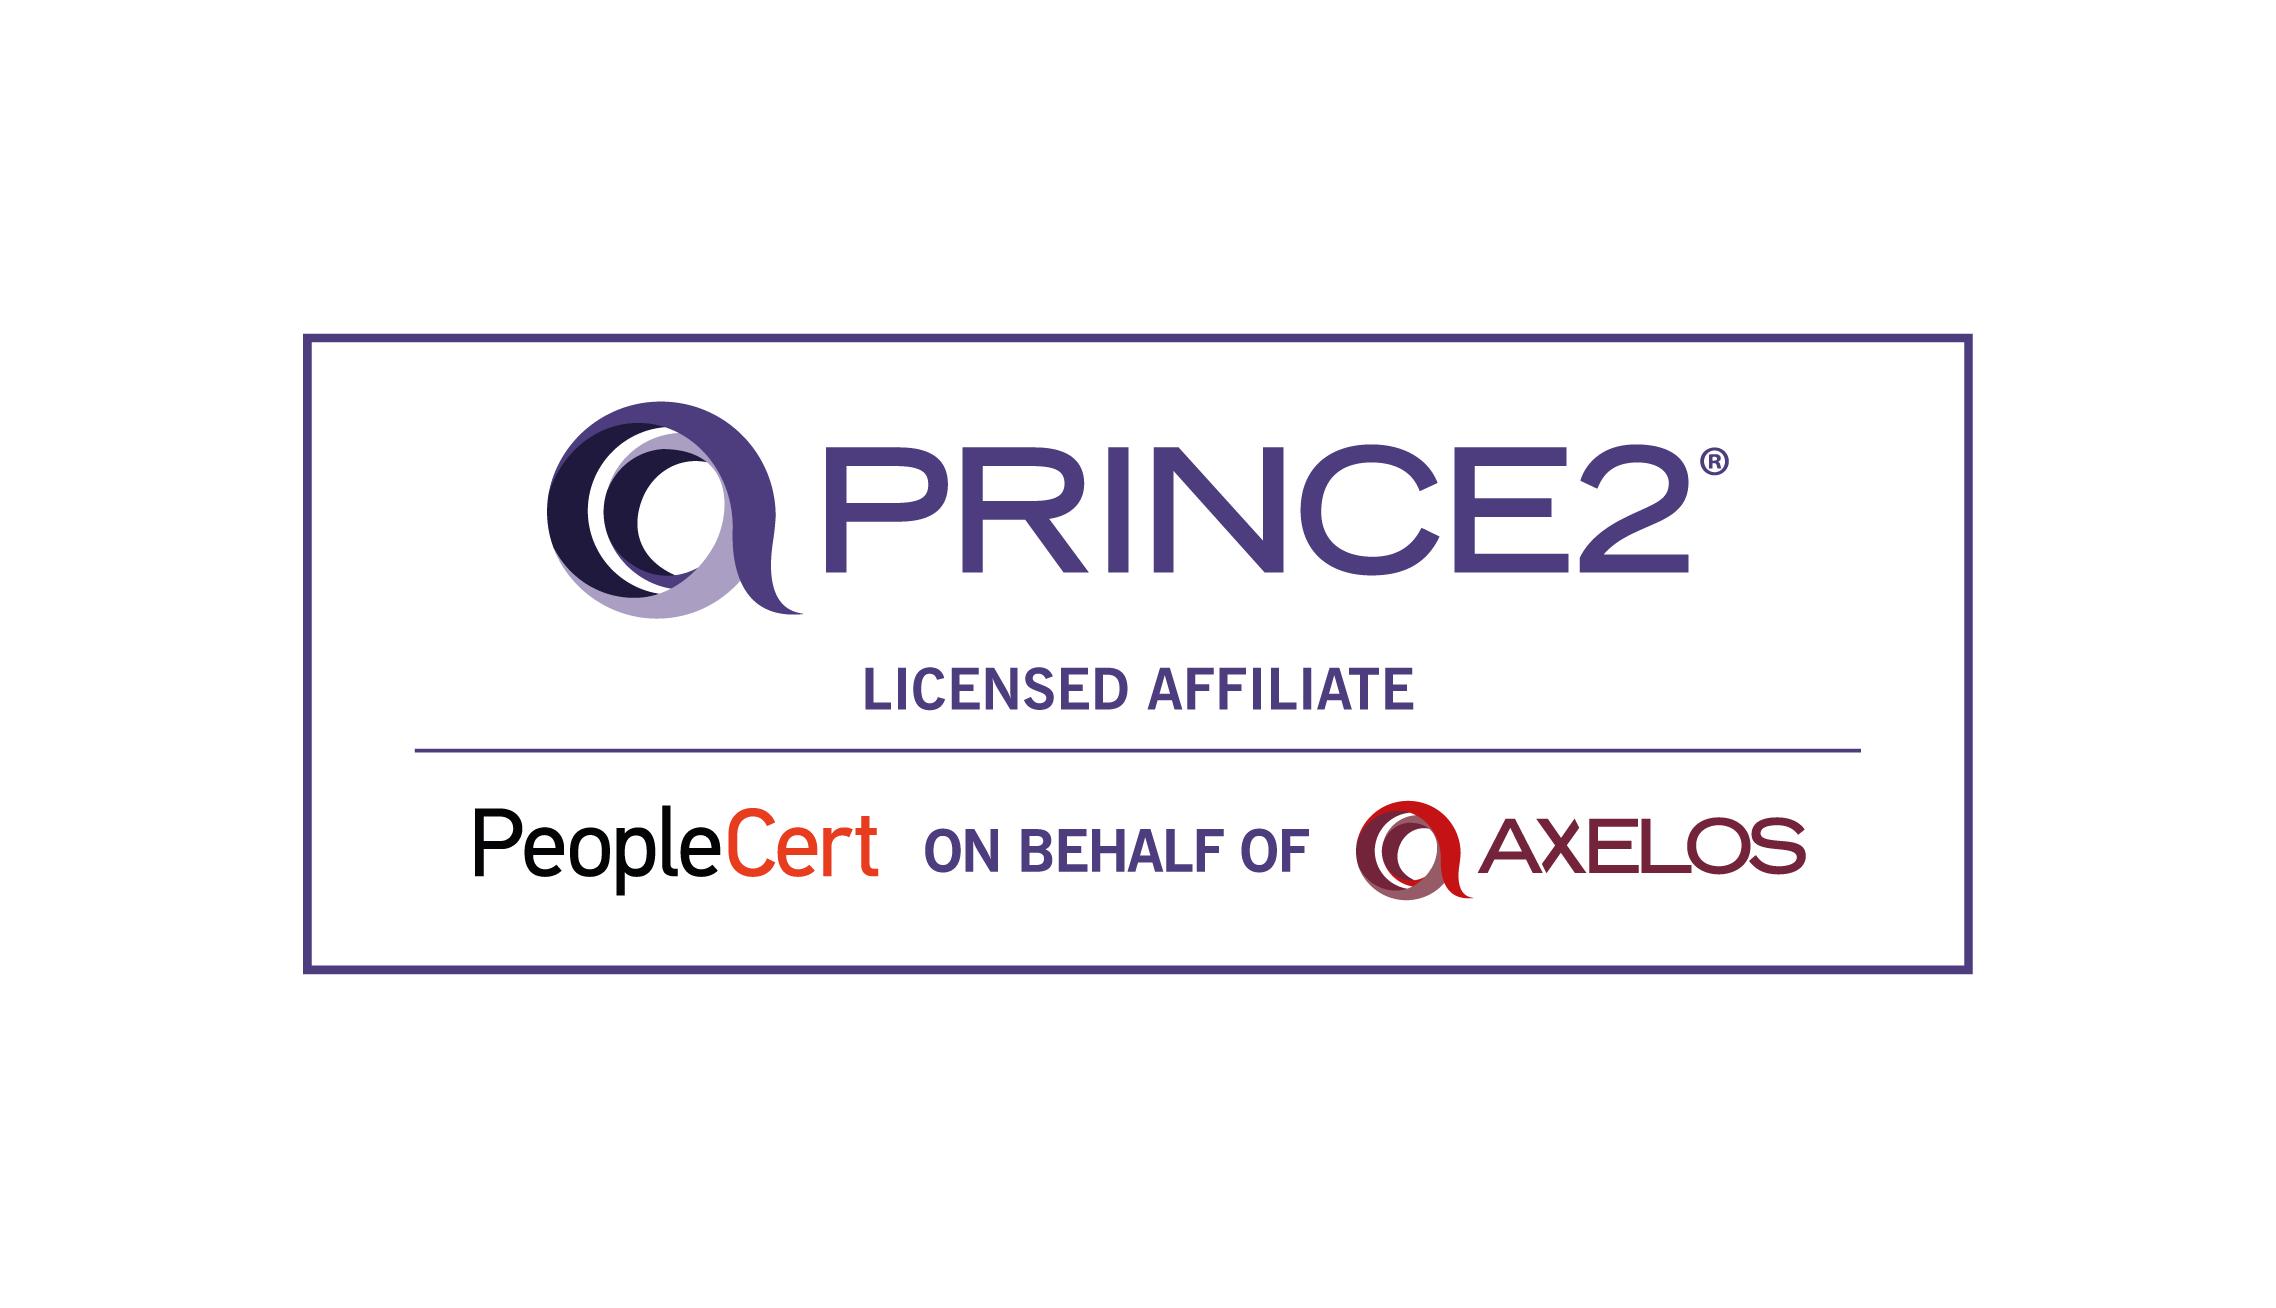 PRINCE2_Affiliate logo